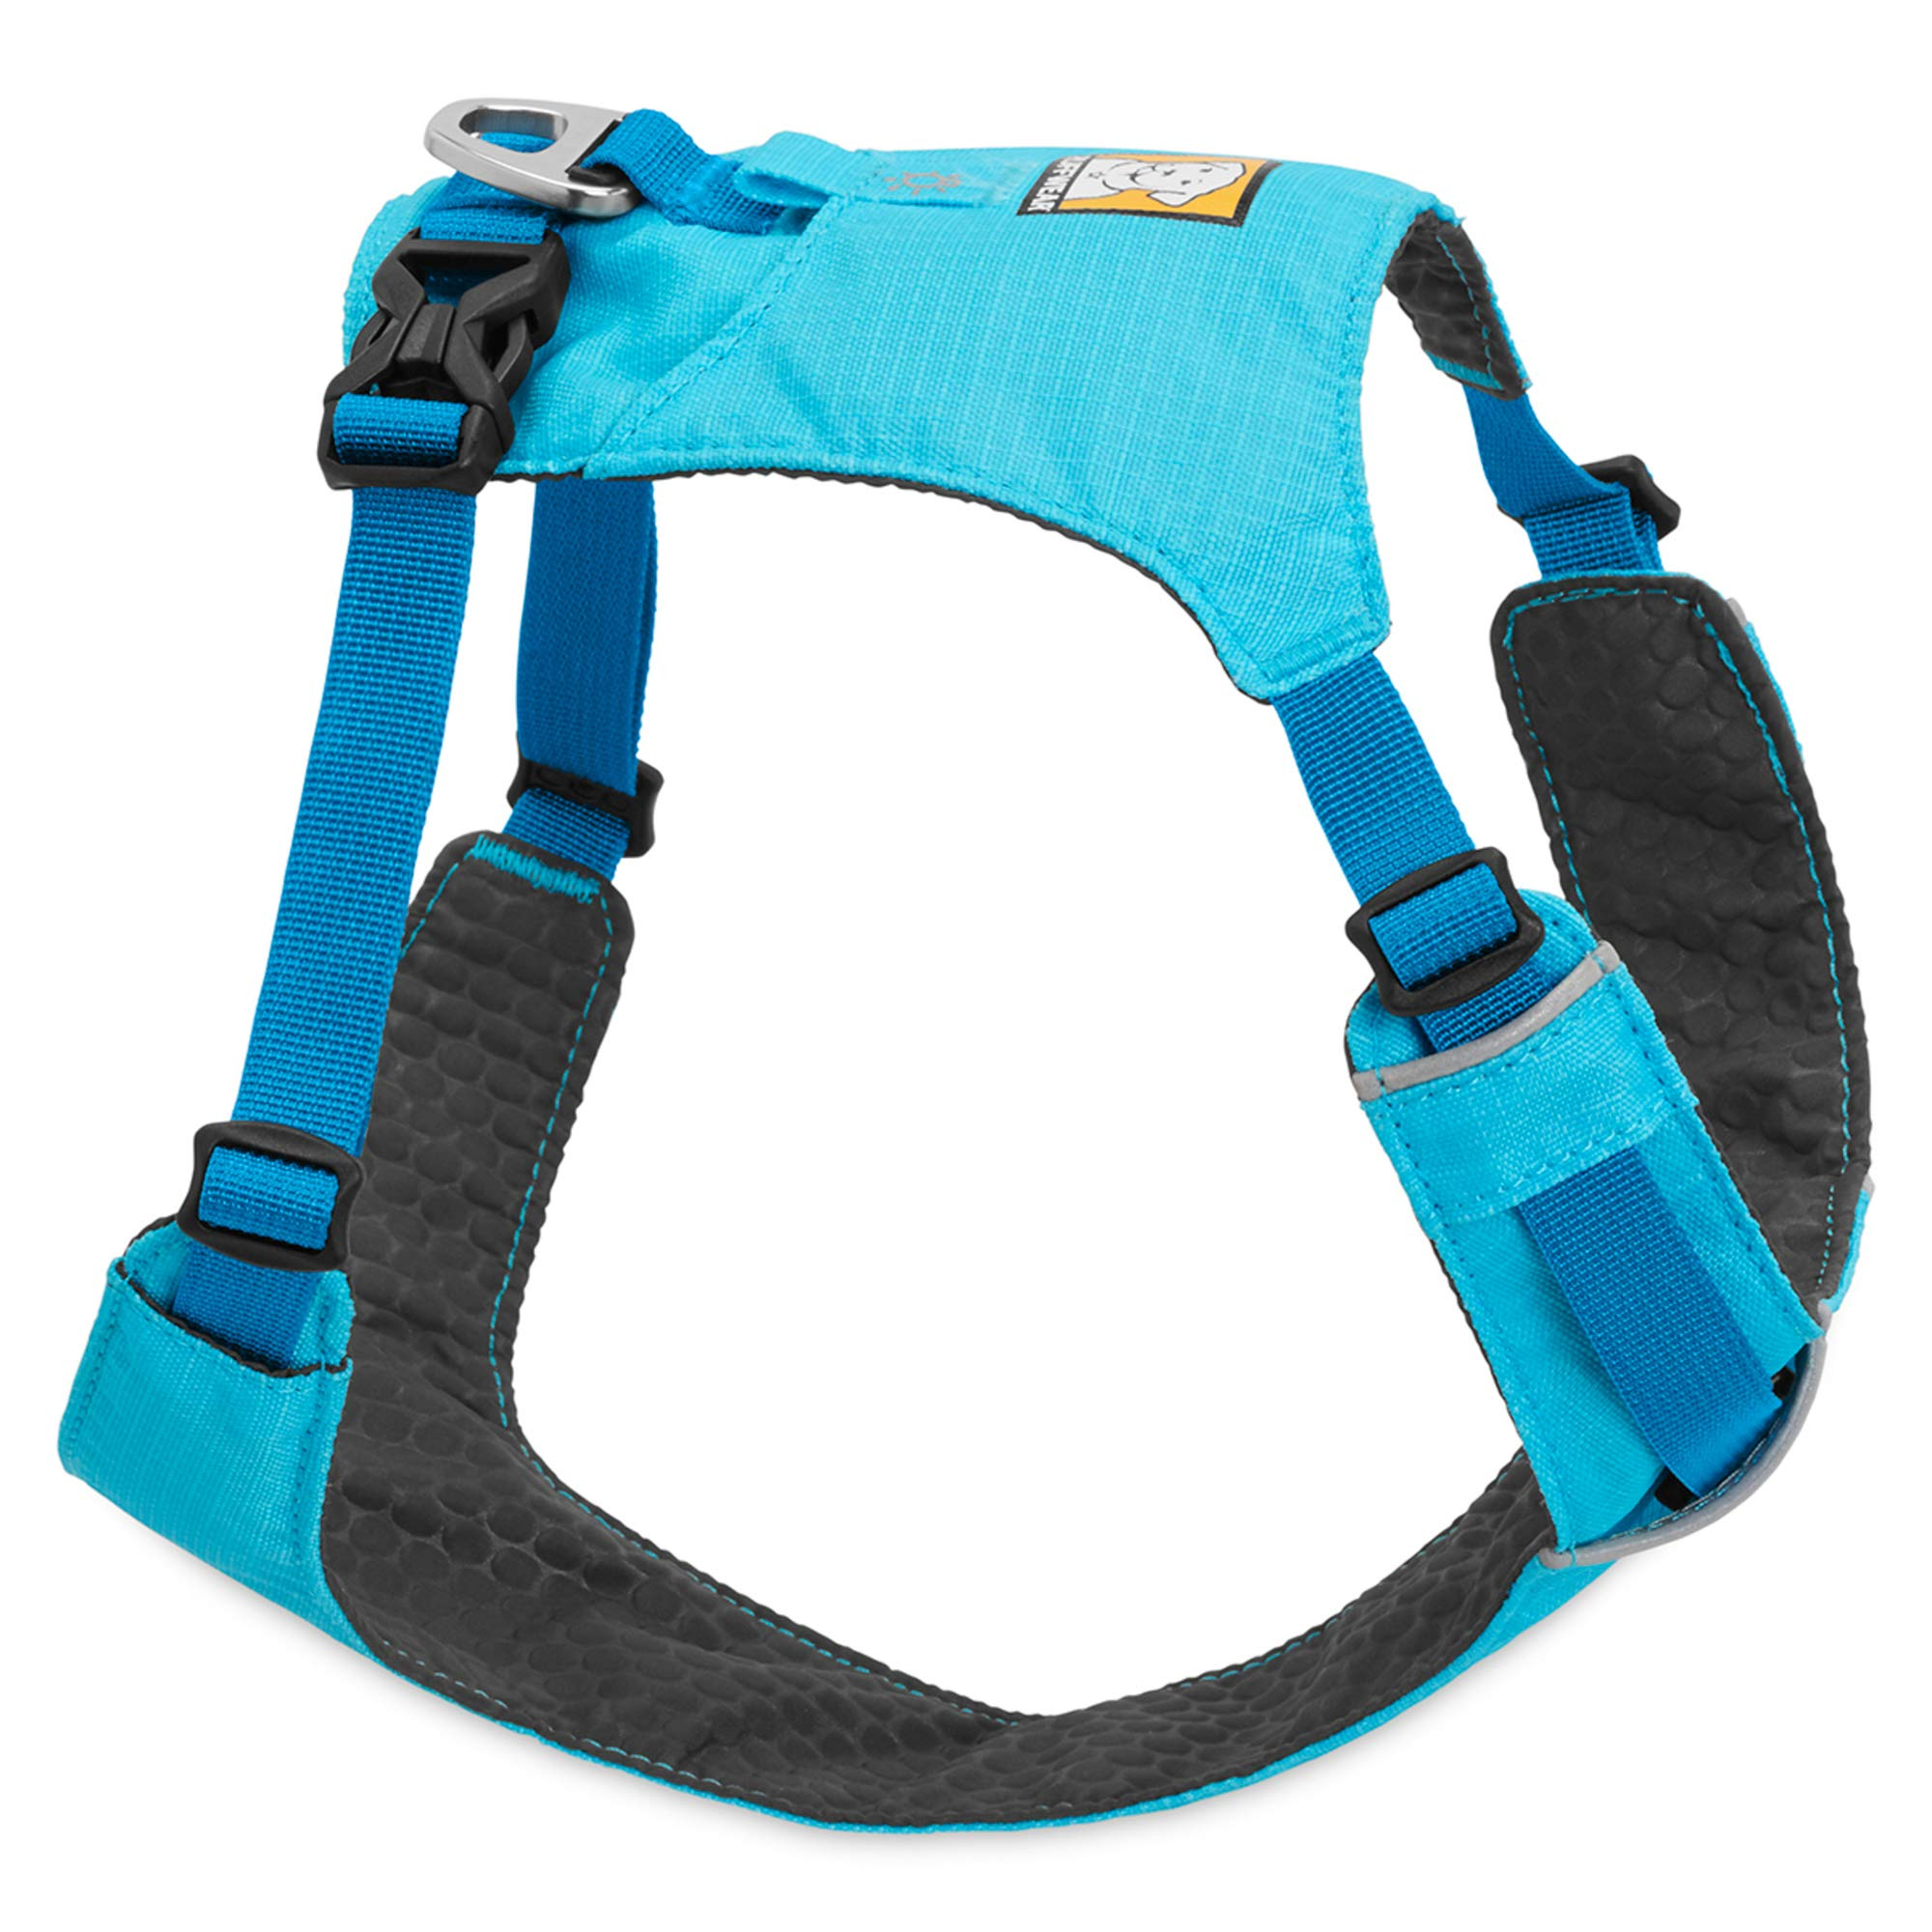 RUFFWEAR - RUFFWEAR, Hi & Light, Everyday Lightweight Dog Harness, Trail Running, Walking, Hiking, All-Day Wear, Blue Atoll, Large/X-Large